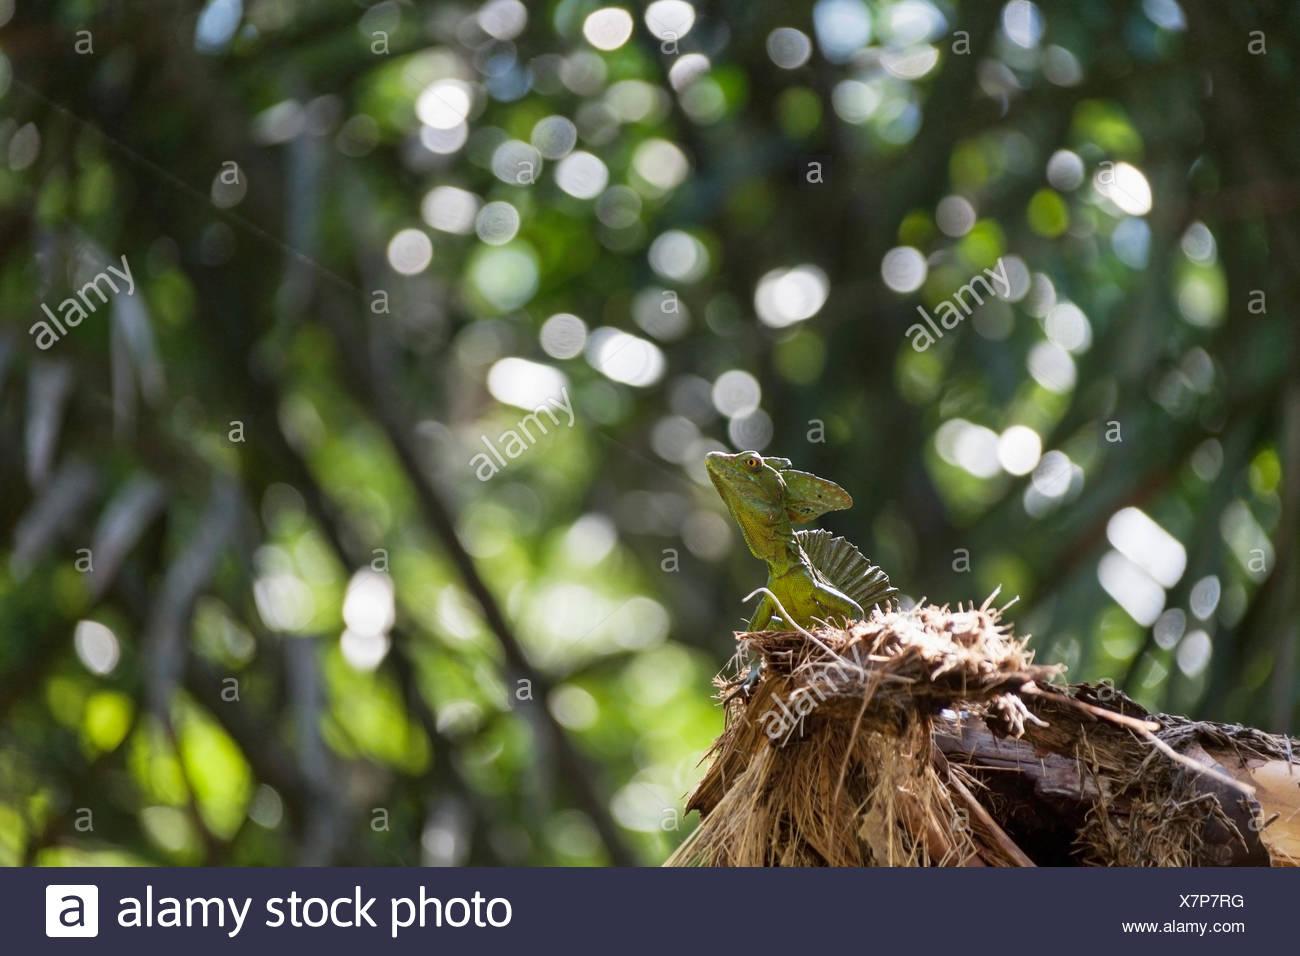 Plumed basilisk lizard in national park, Costa Rica Stock Photo